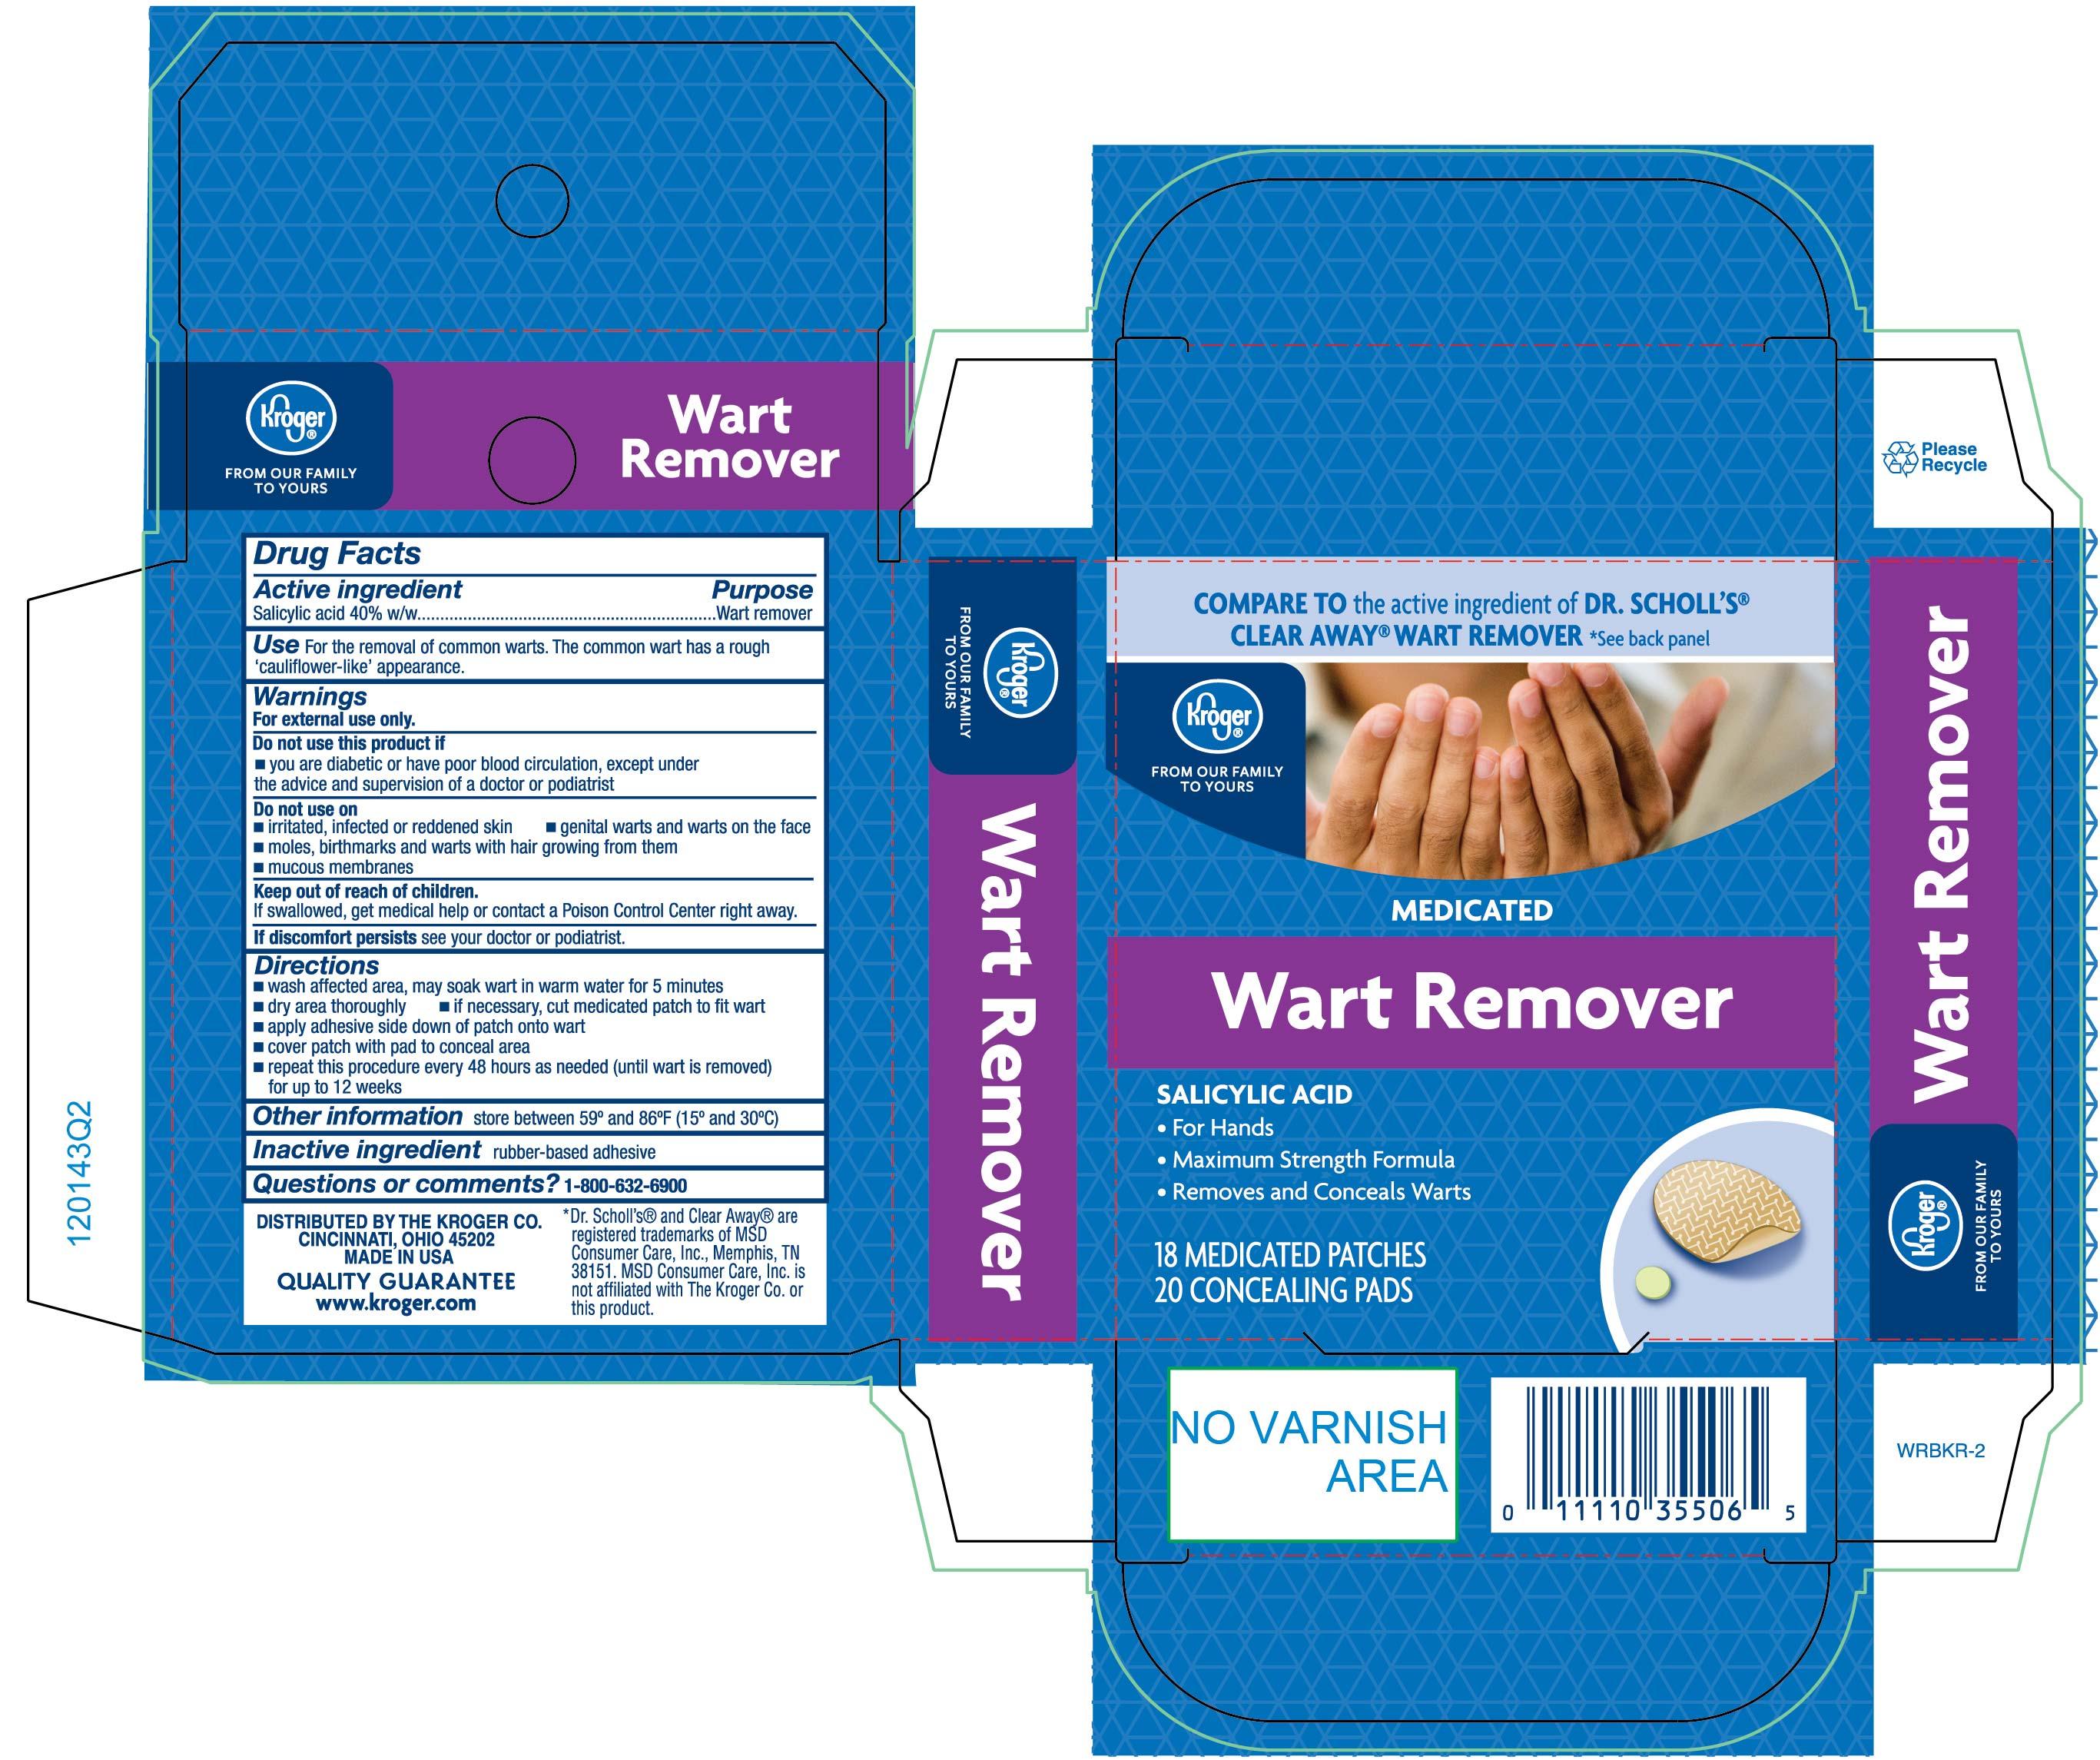 KROGER_Wart Remover.jpg